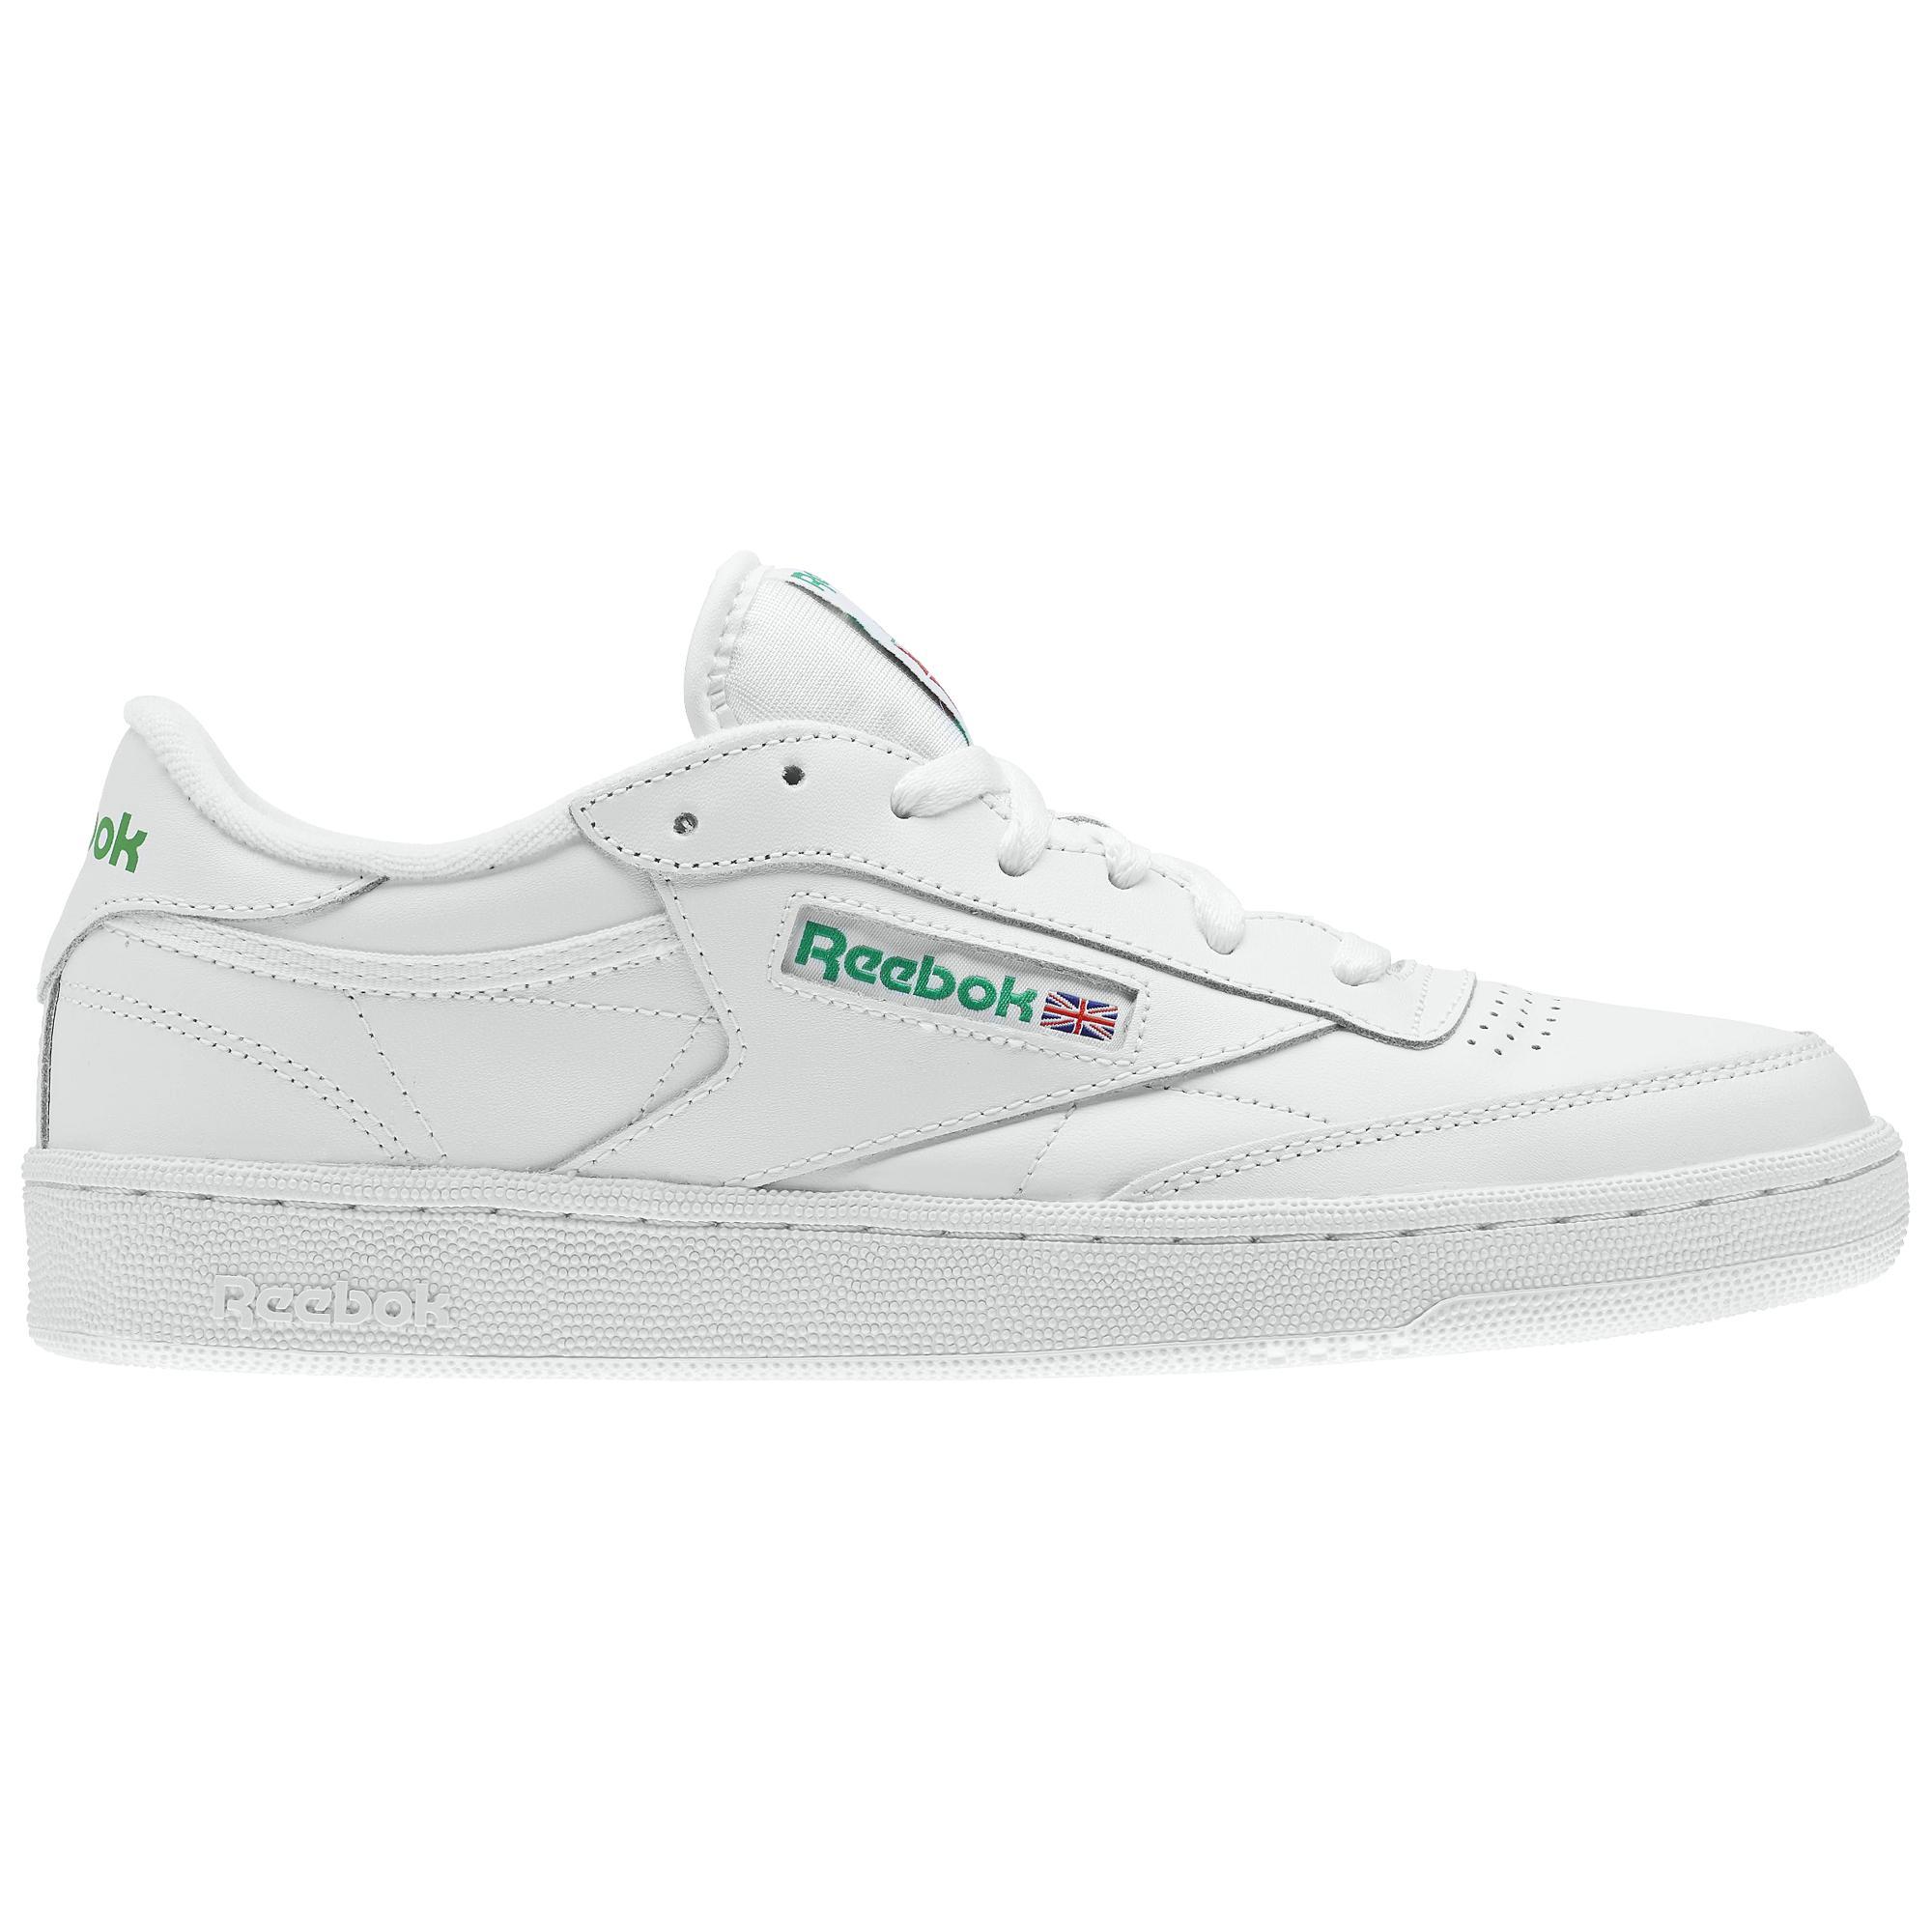 e6fab6f6d5f4e1 Reebok Shoes Club C 85 Intense White green - Tifoshop.com